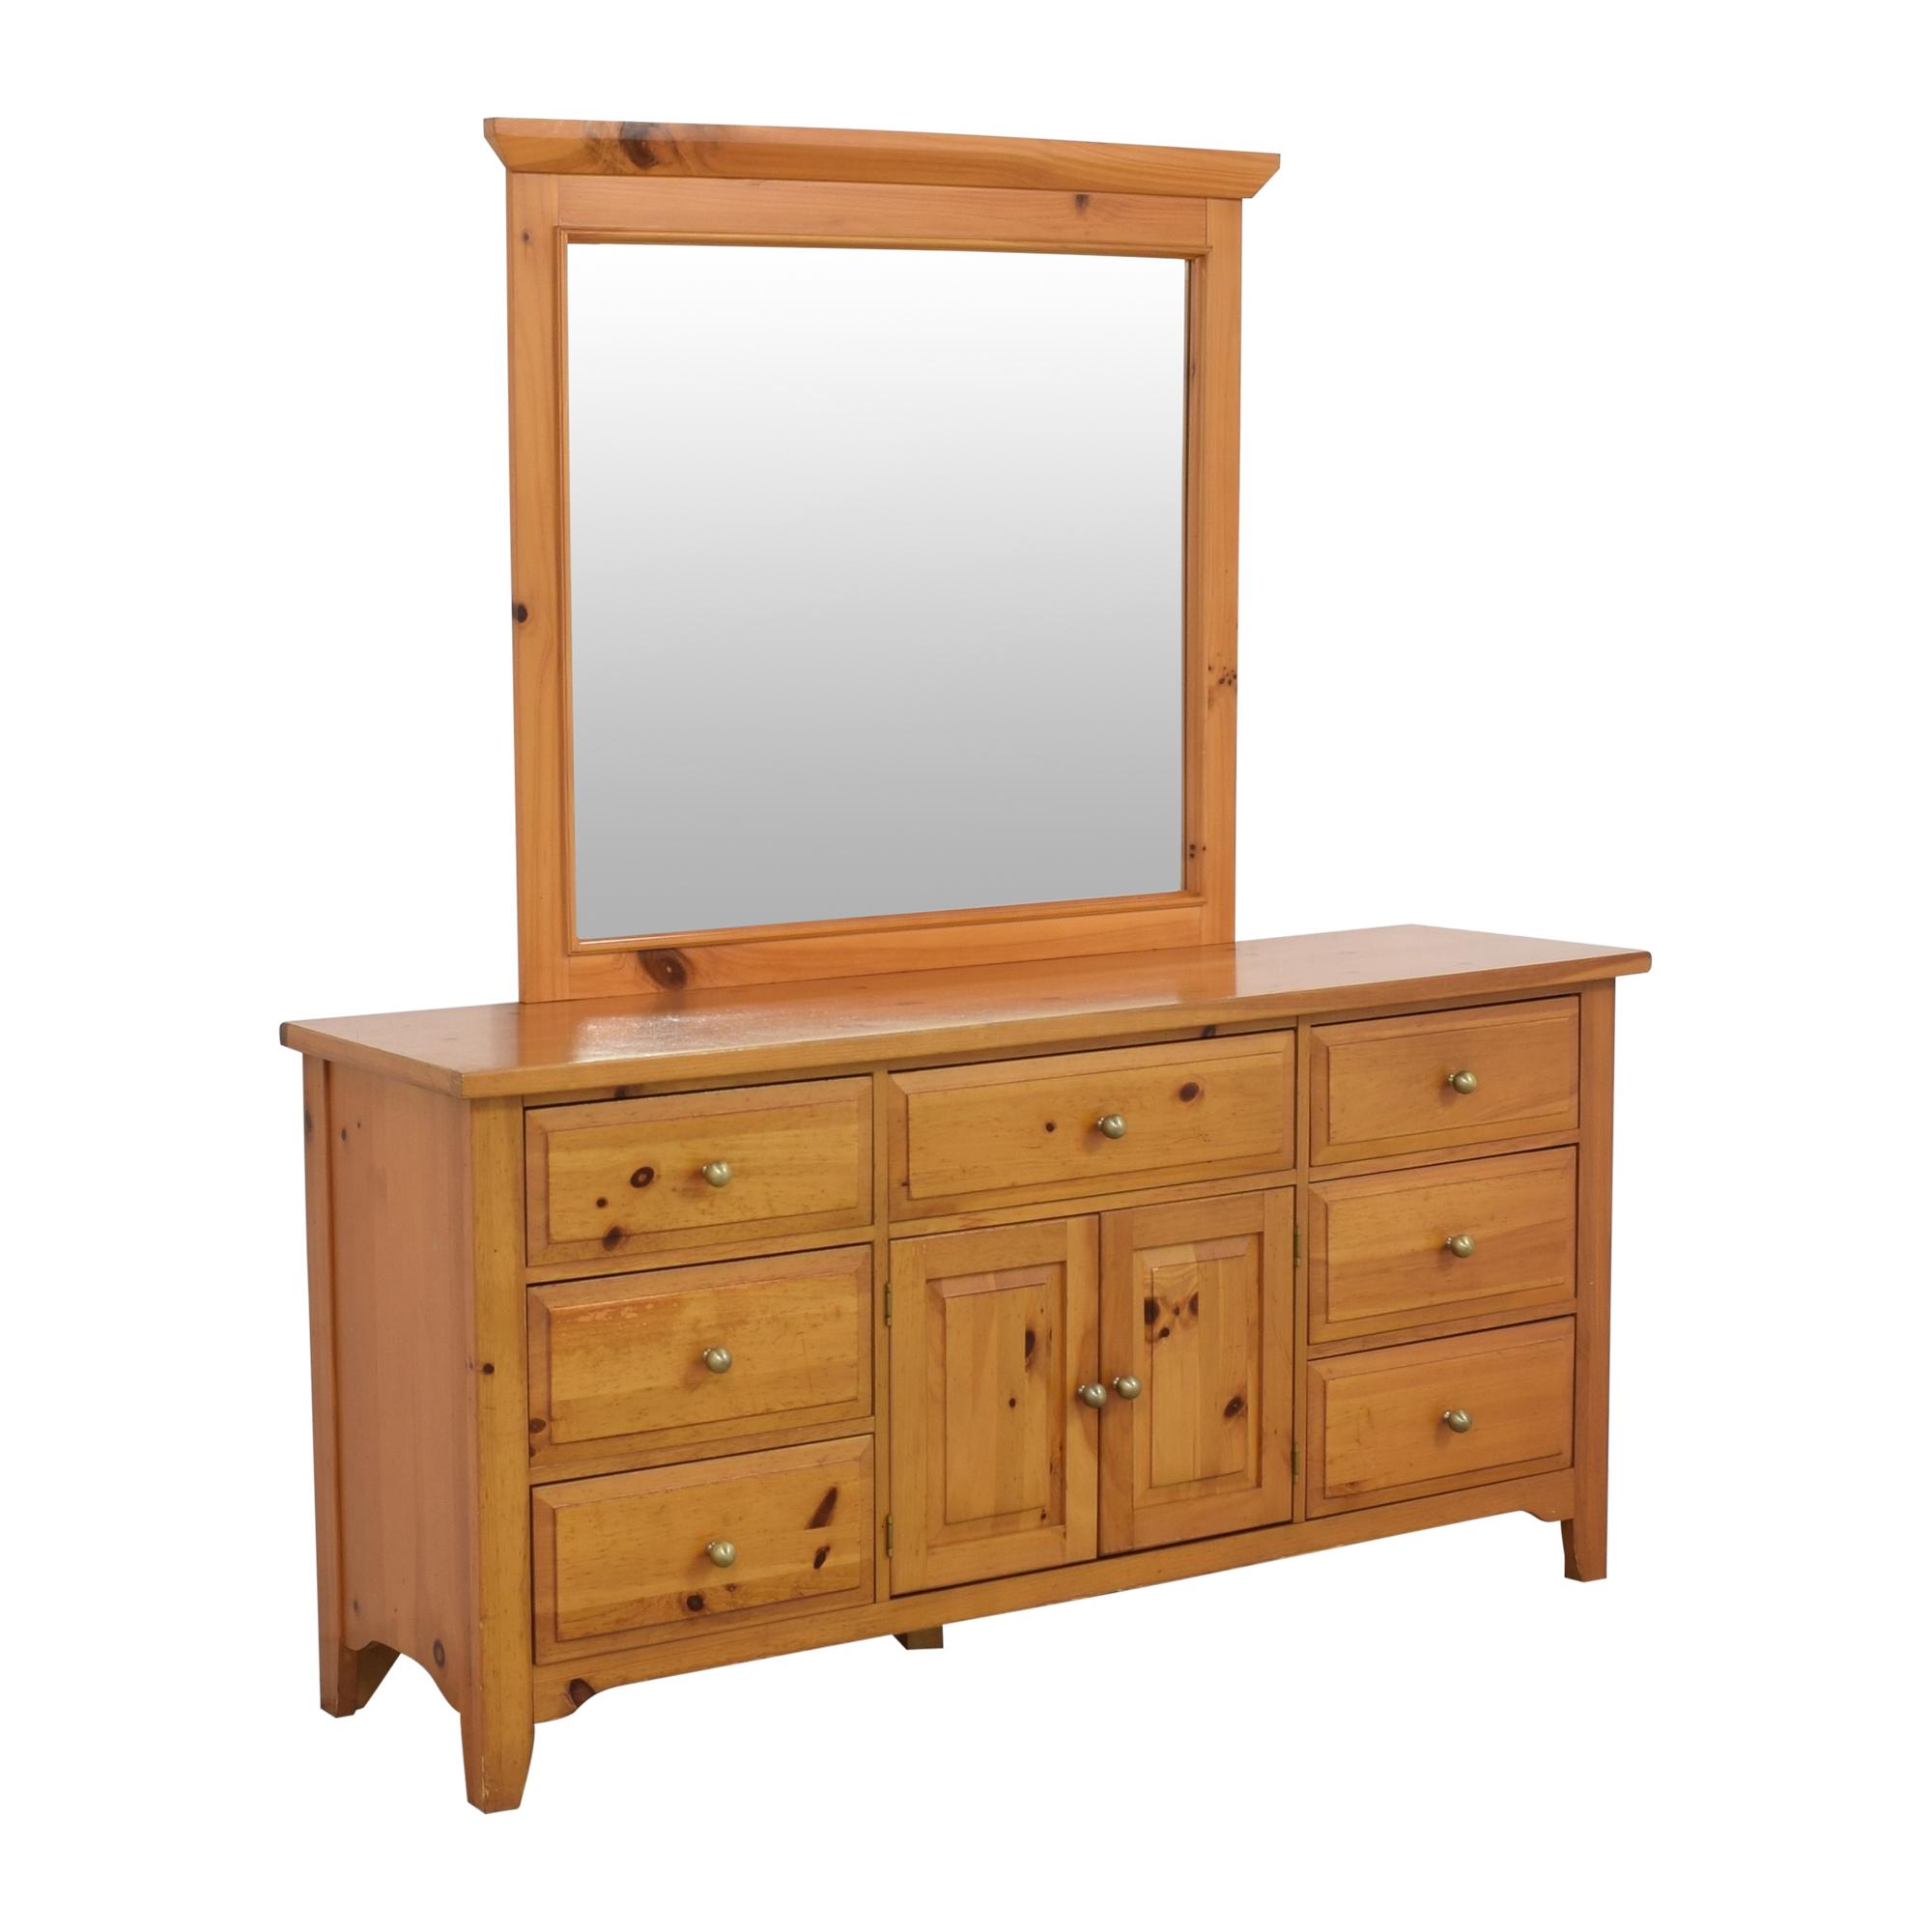 Broyhill Furniture Broyhill Shaker Style Dresser and Mirror nj